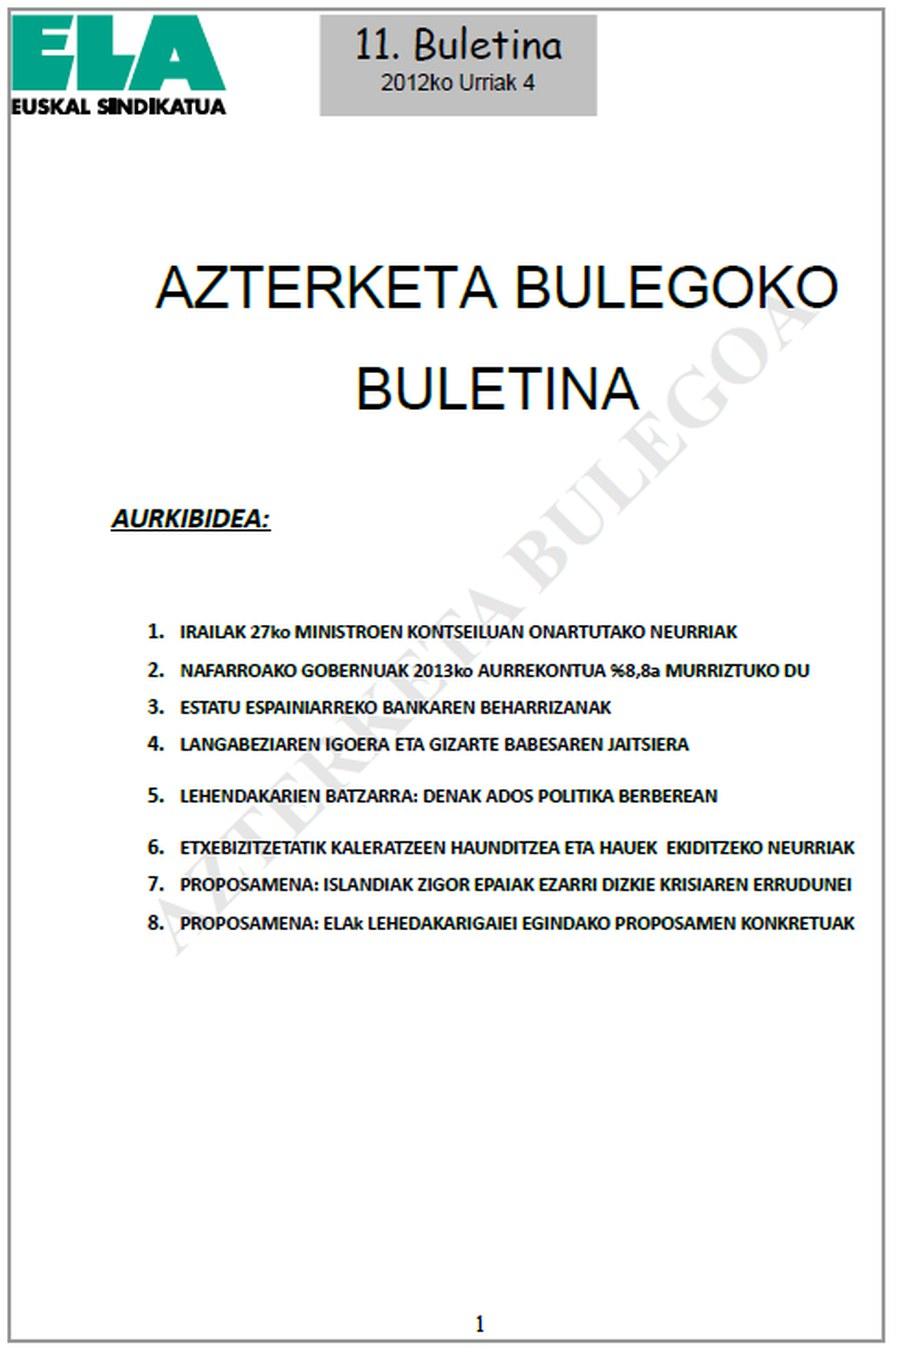 11buletina.bmp